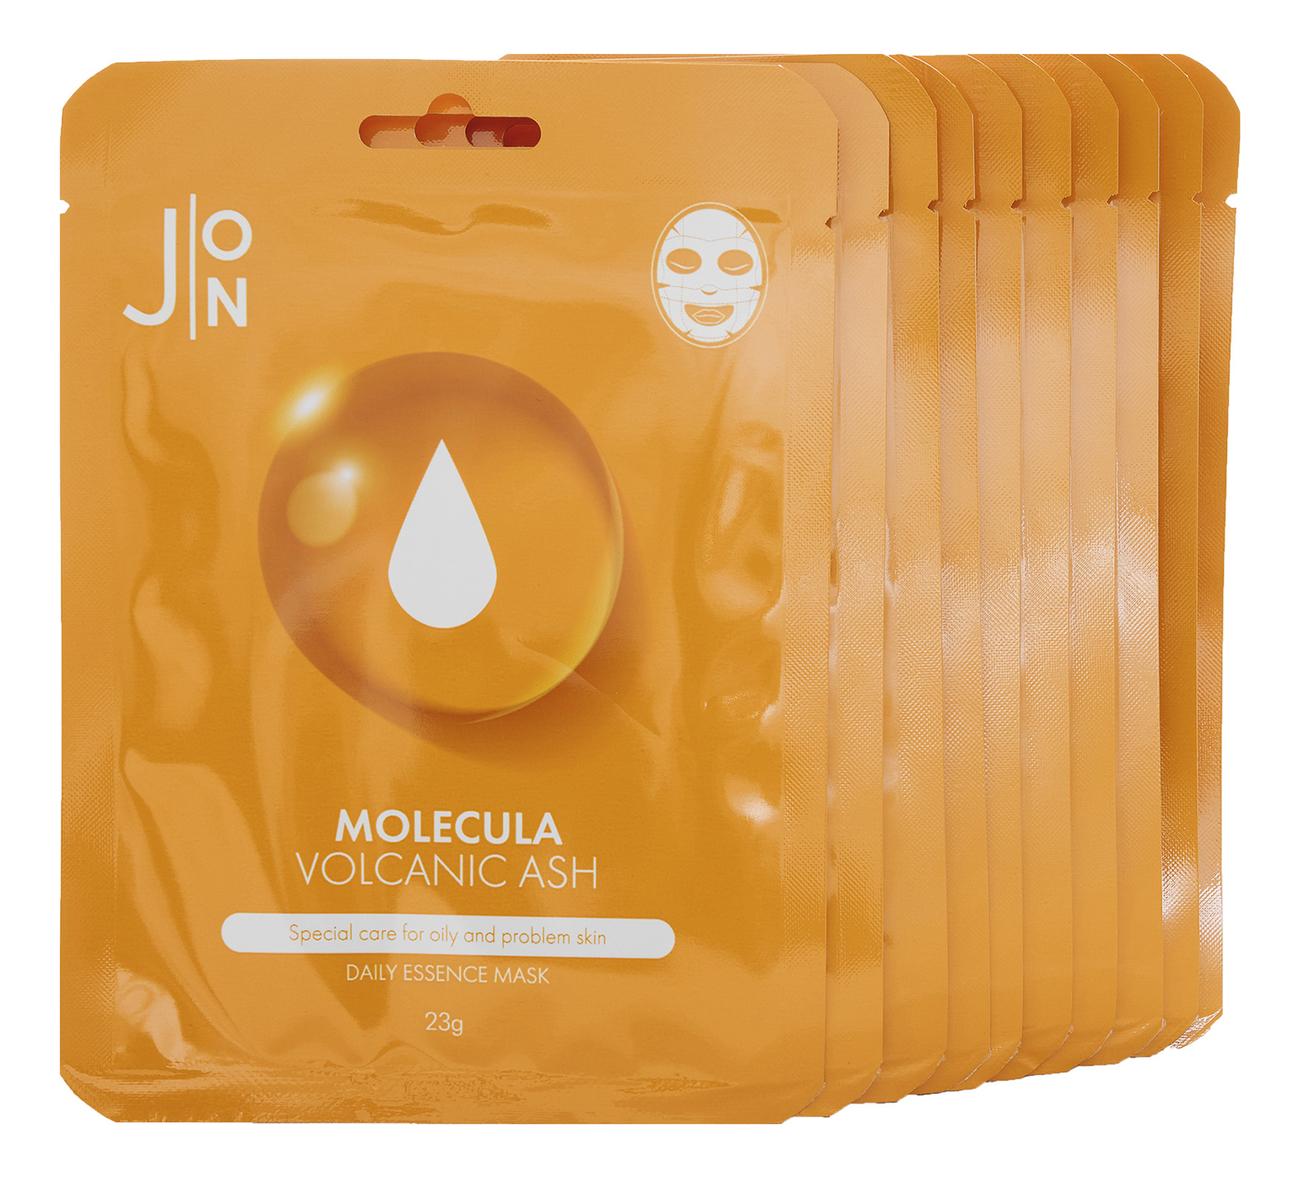 Тканевая маска для лица Molecula Volcanic Daily Essence Mask: Маска 10*23г lebelage тканевая маска для лица увлажняющая aqua natural mask 23г